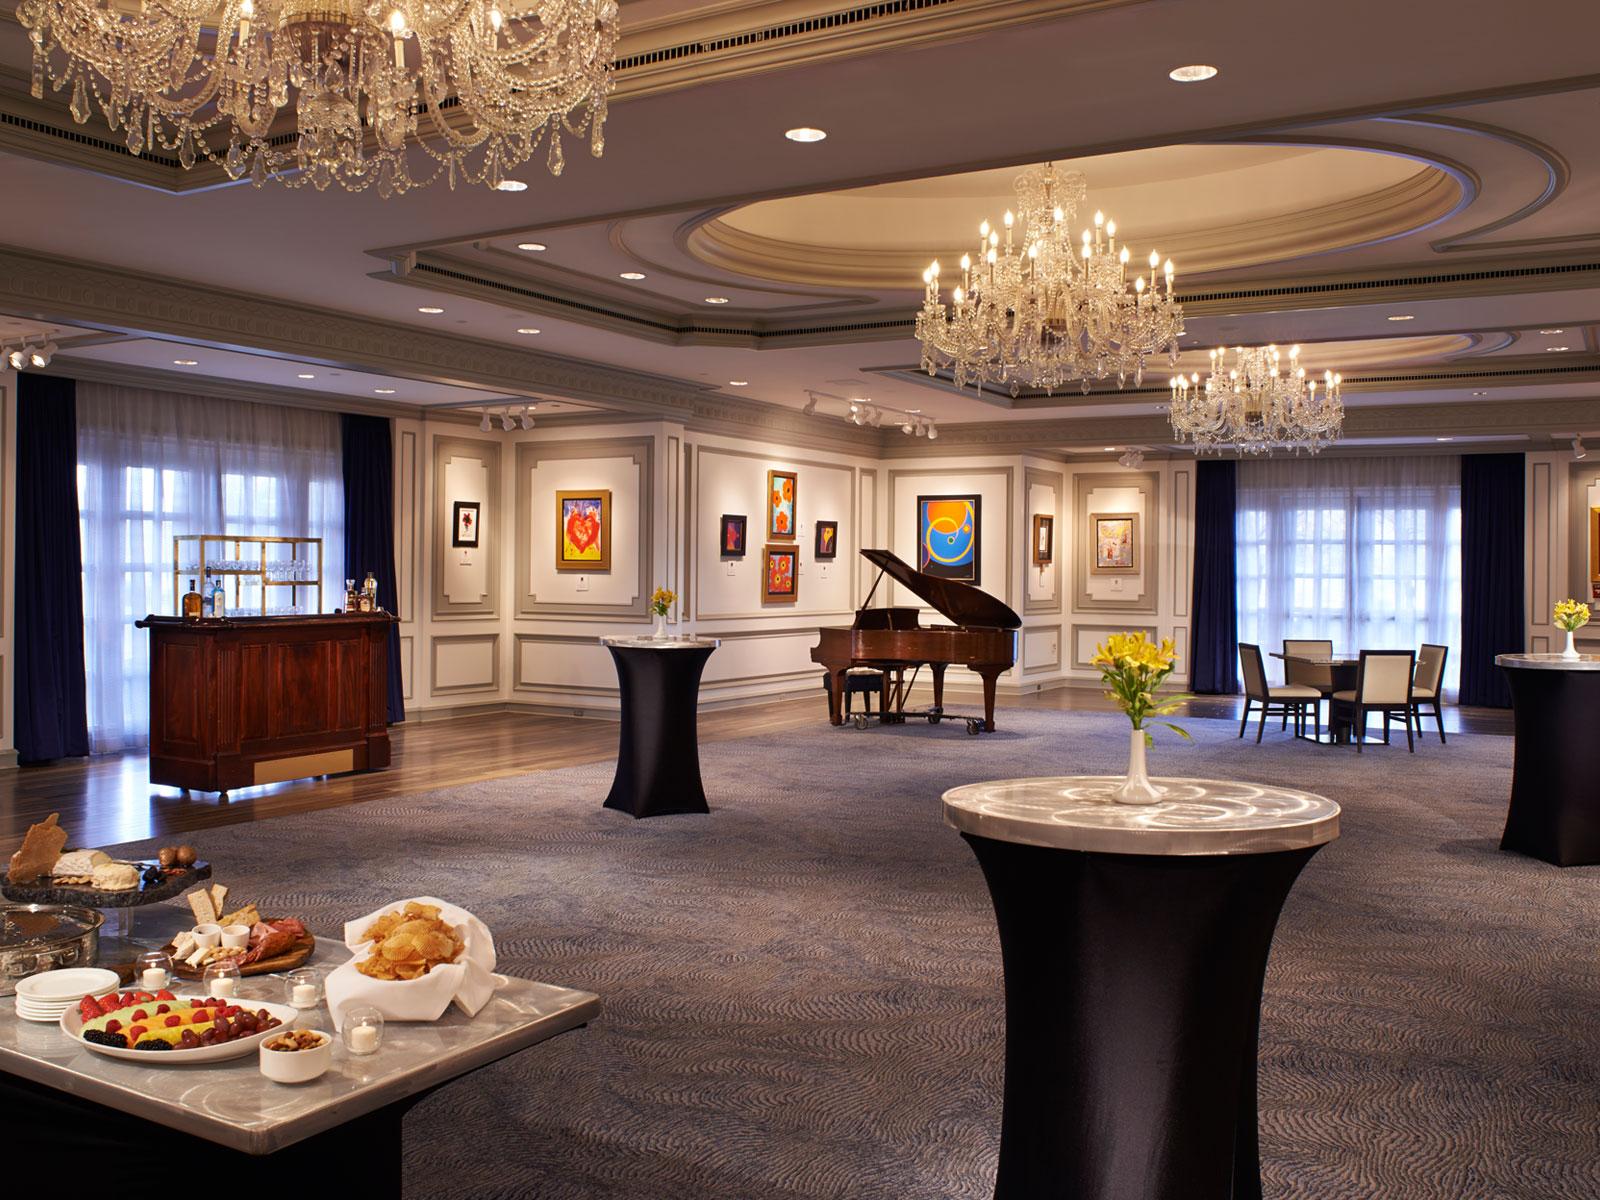 dearborn mi hotel reviews the henry marriott autograph. Black Bedroom Furniture Sets. Home Design Ideas